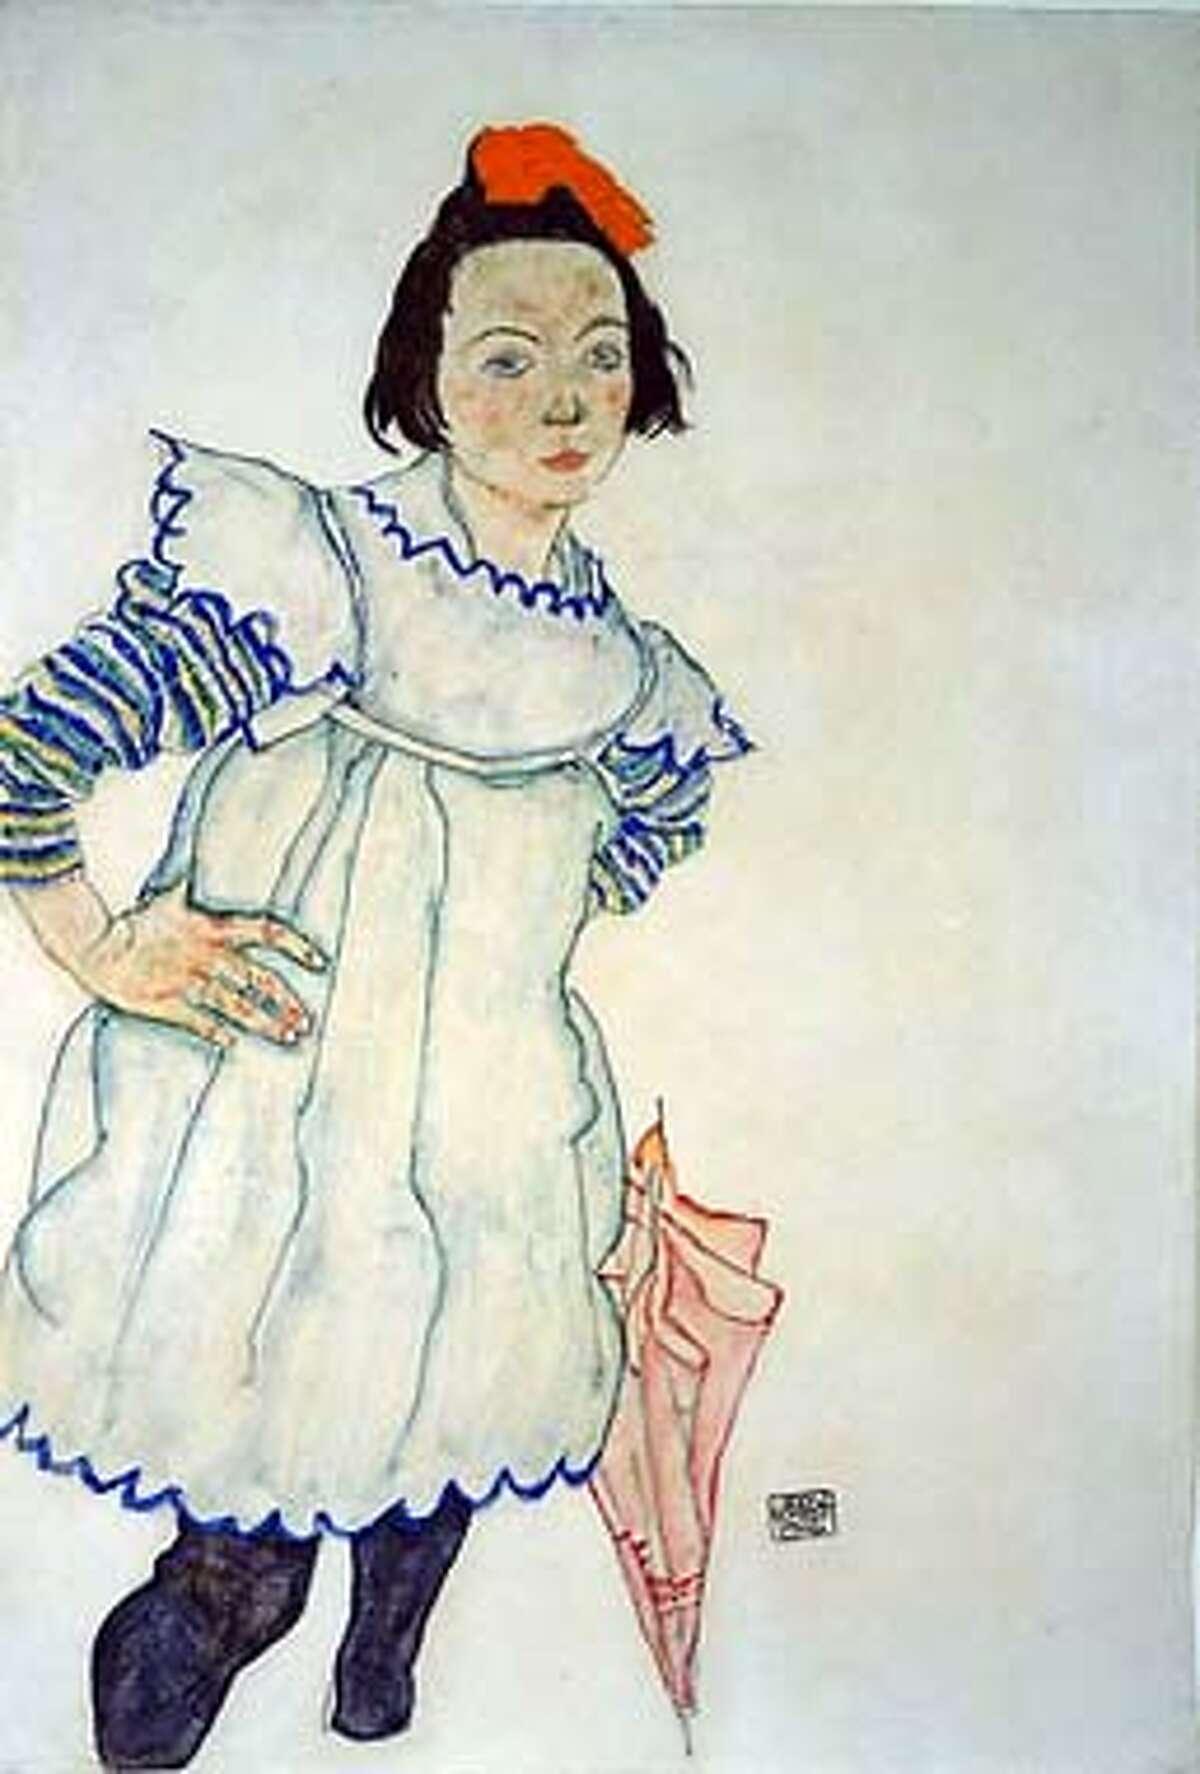 ARTNOTES30 Drawing by Egon Schiele, 1916.